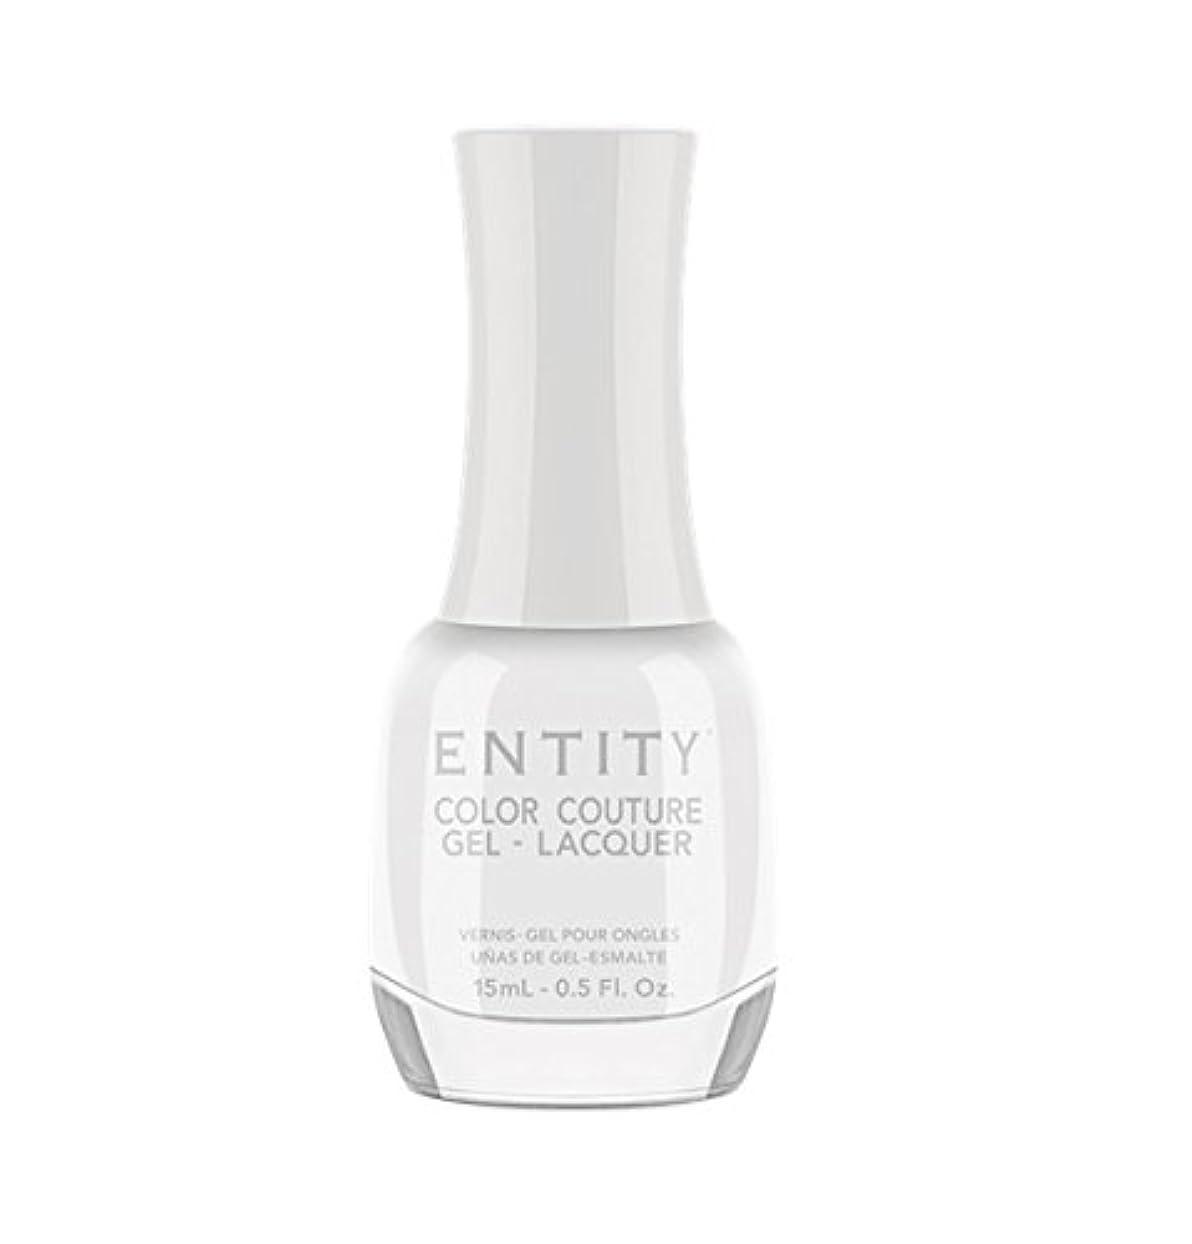 Entity Color Couture Gel-Lacquer - White Light - 15 ml/0.5 oz